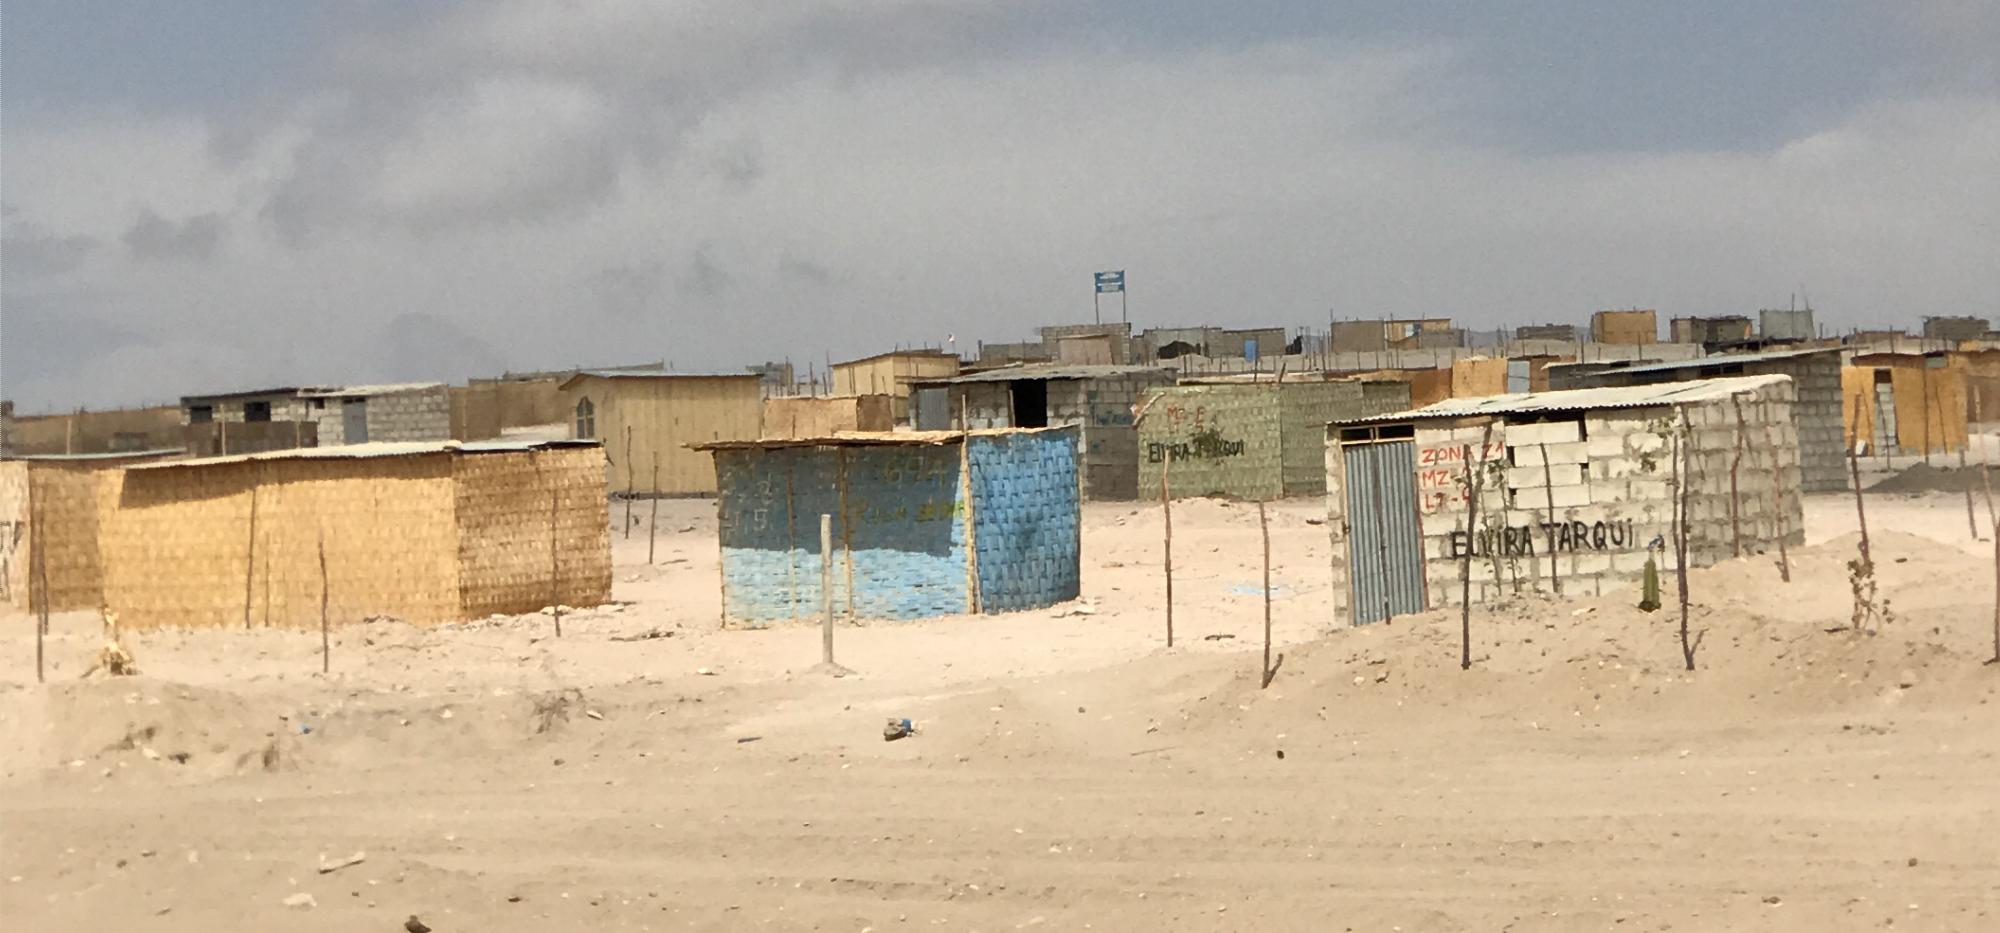 Rural housing near the Peruvian city of Tacna